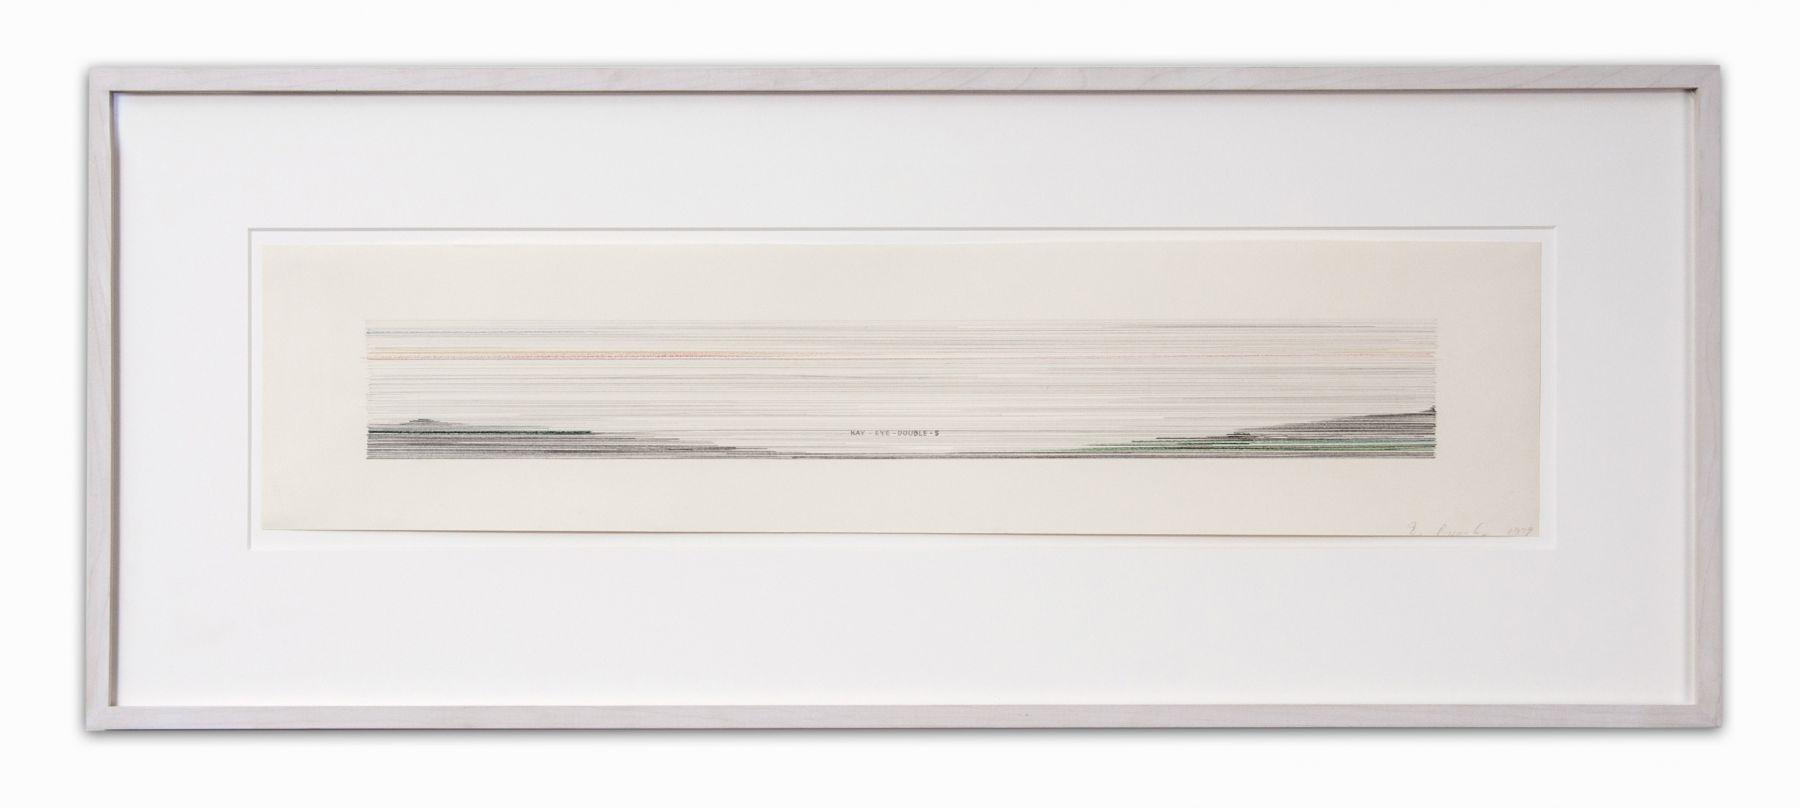 "Ed Ruscha_ KISS, 1979 (7 3:8"" x 34"") Wall - Casterline|Goodman Gallery.jpg"